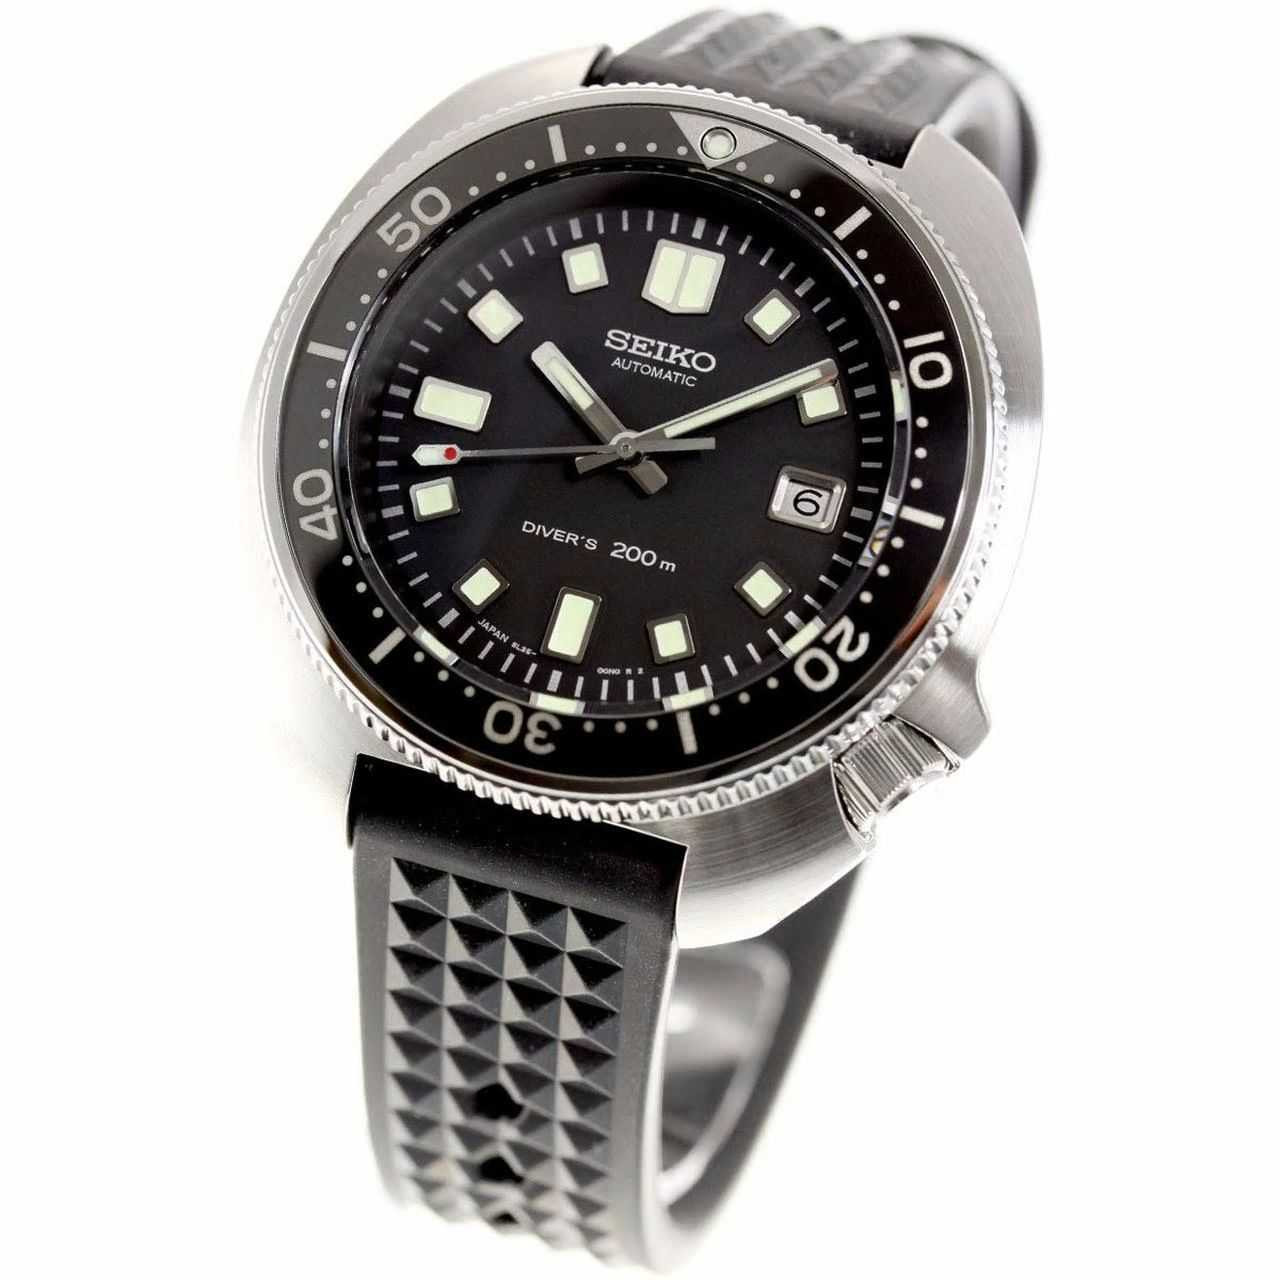 Seiko 1970 Diver's Re-Creation Limited SBDX031